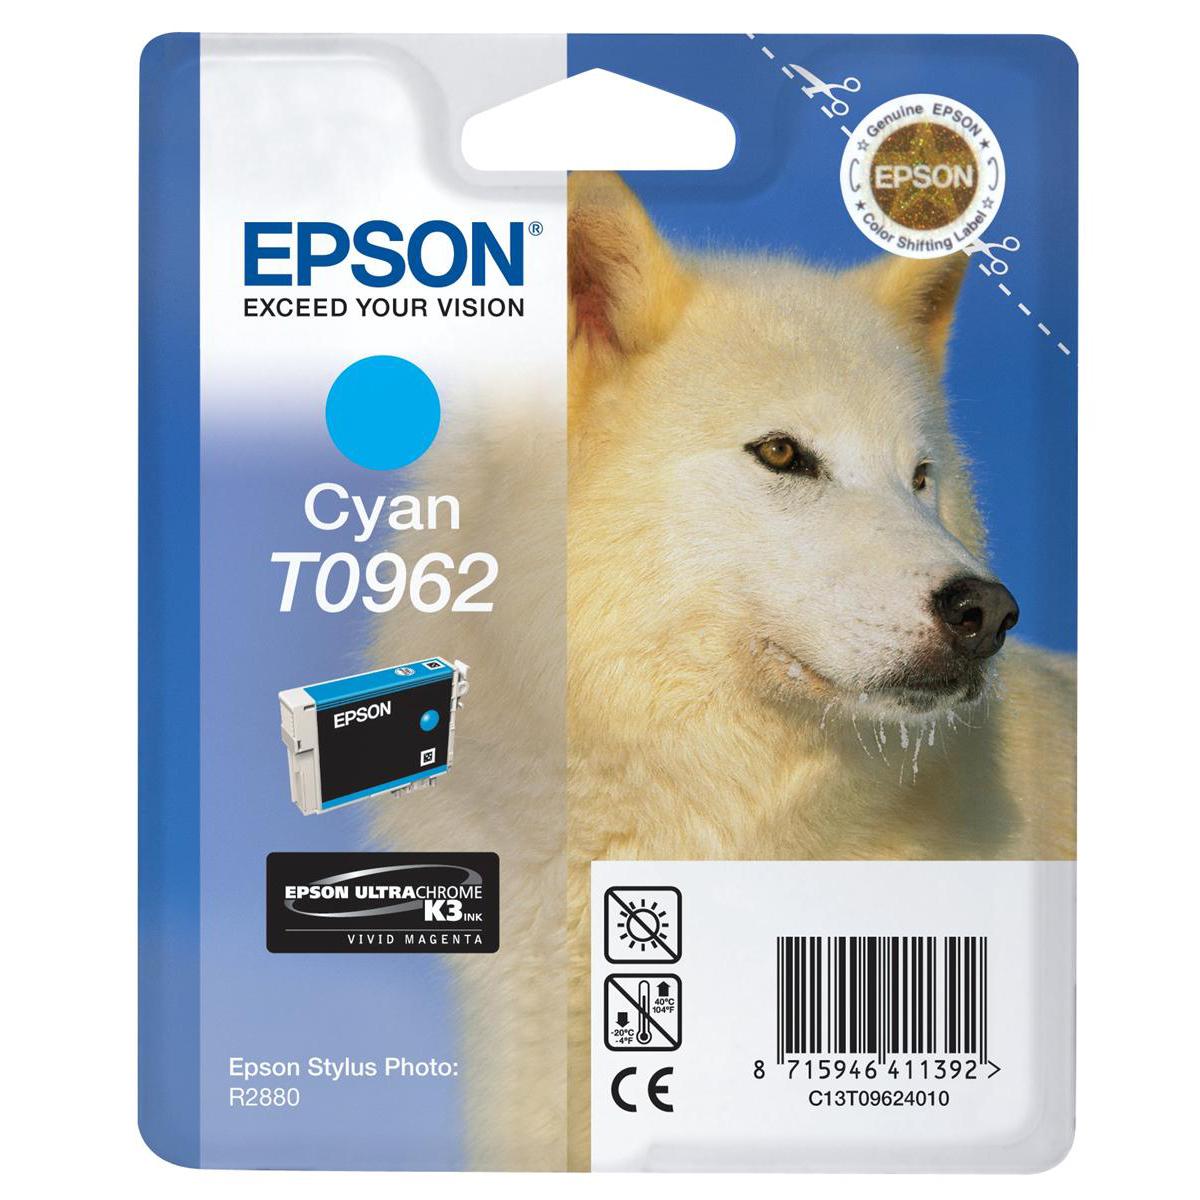 Epson T0962 Inkjet Cartridge UltraChrome K3 Husky Page Life 1505pp Cyan Ref C13T09624010